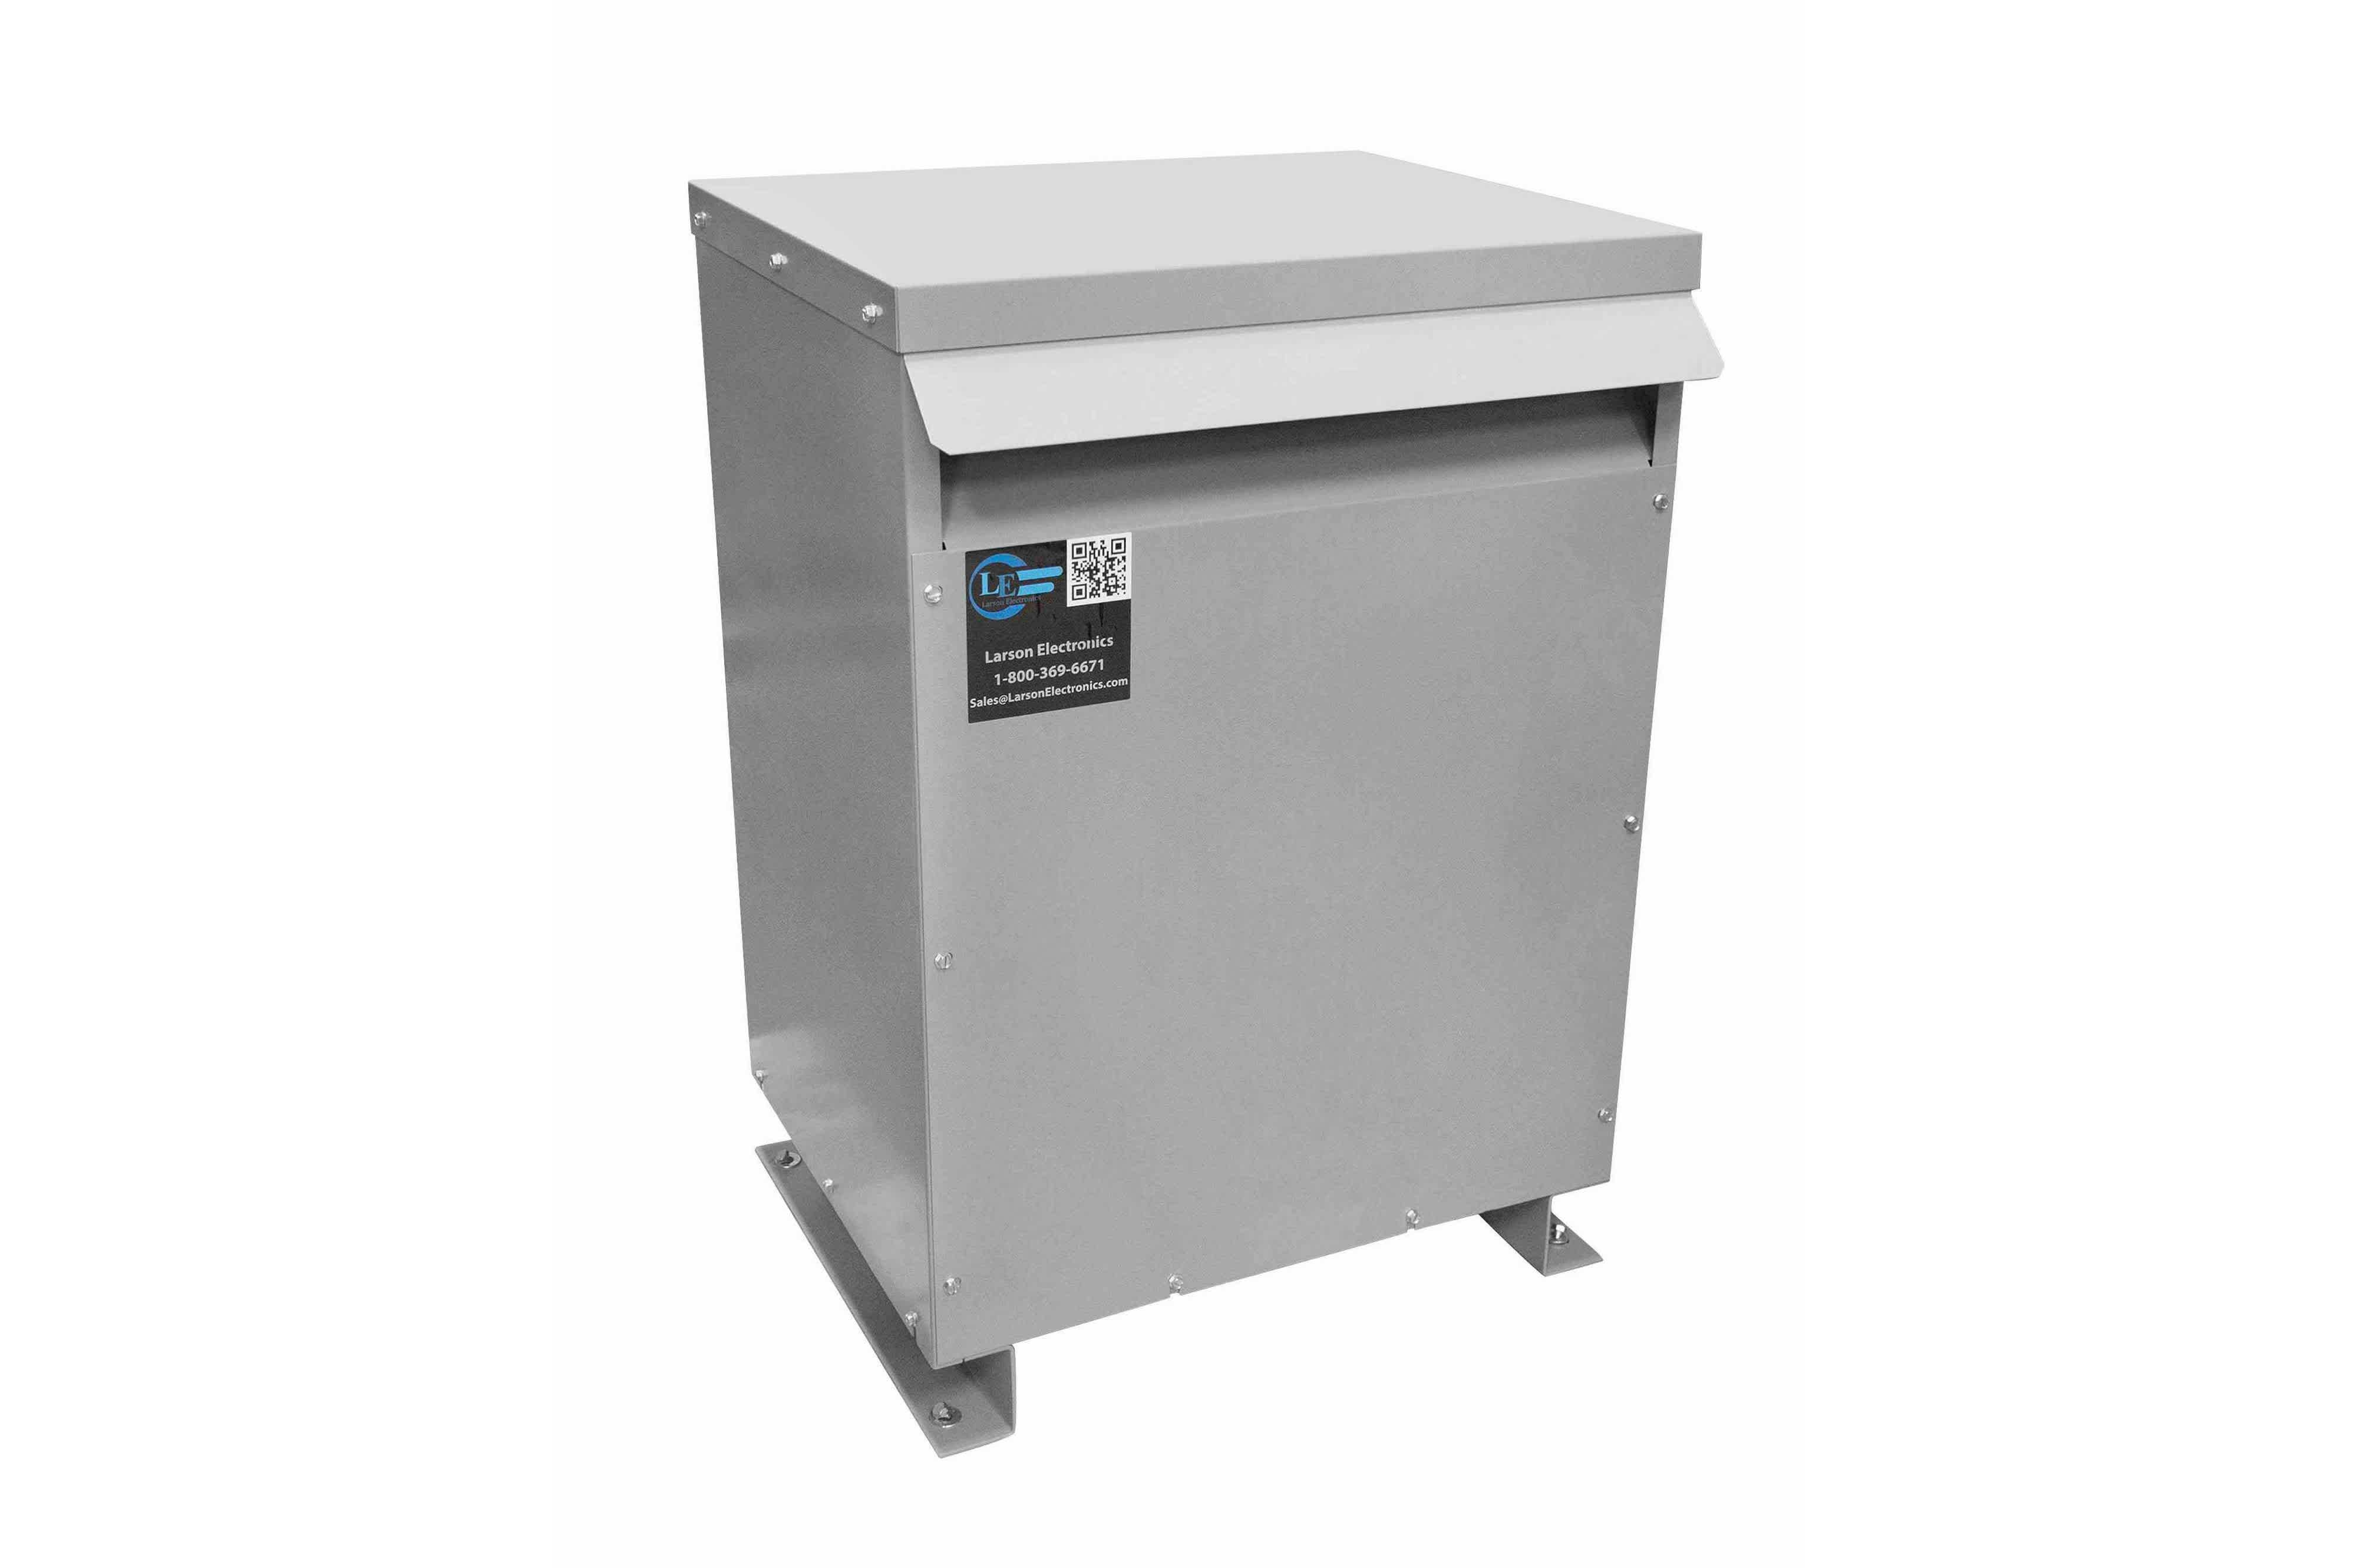 65 kVA 3PH Isolation Transformer, 240V Wye Primary, 400V Delta Secondary, N3R, Ventilated, 60 Hz